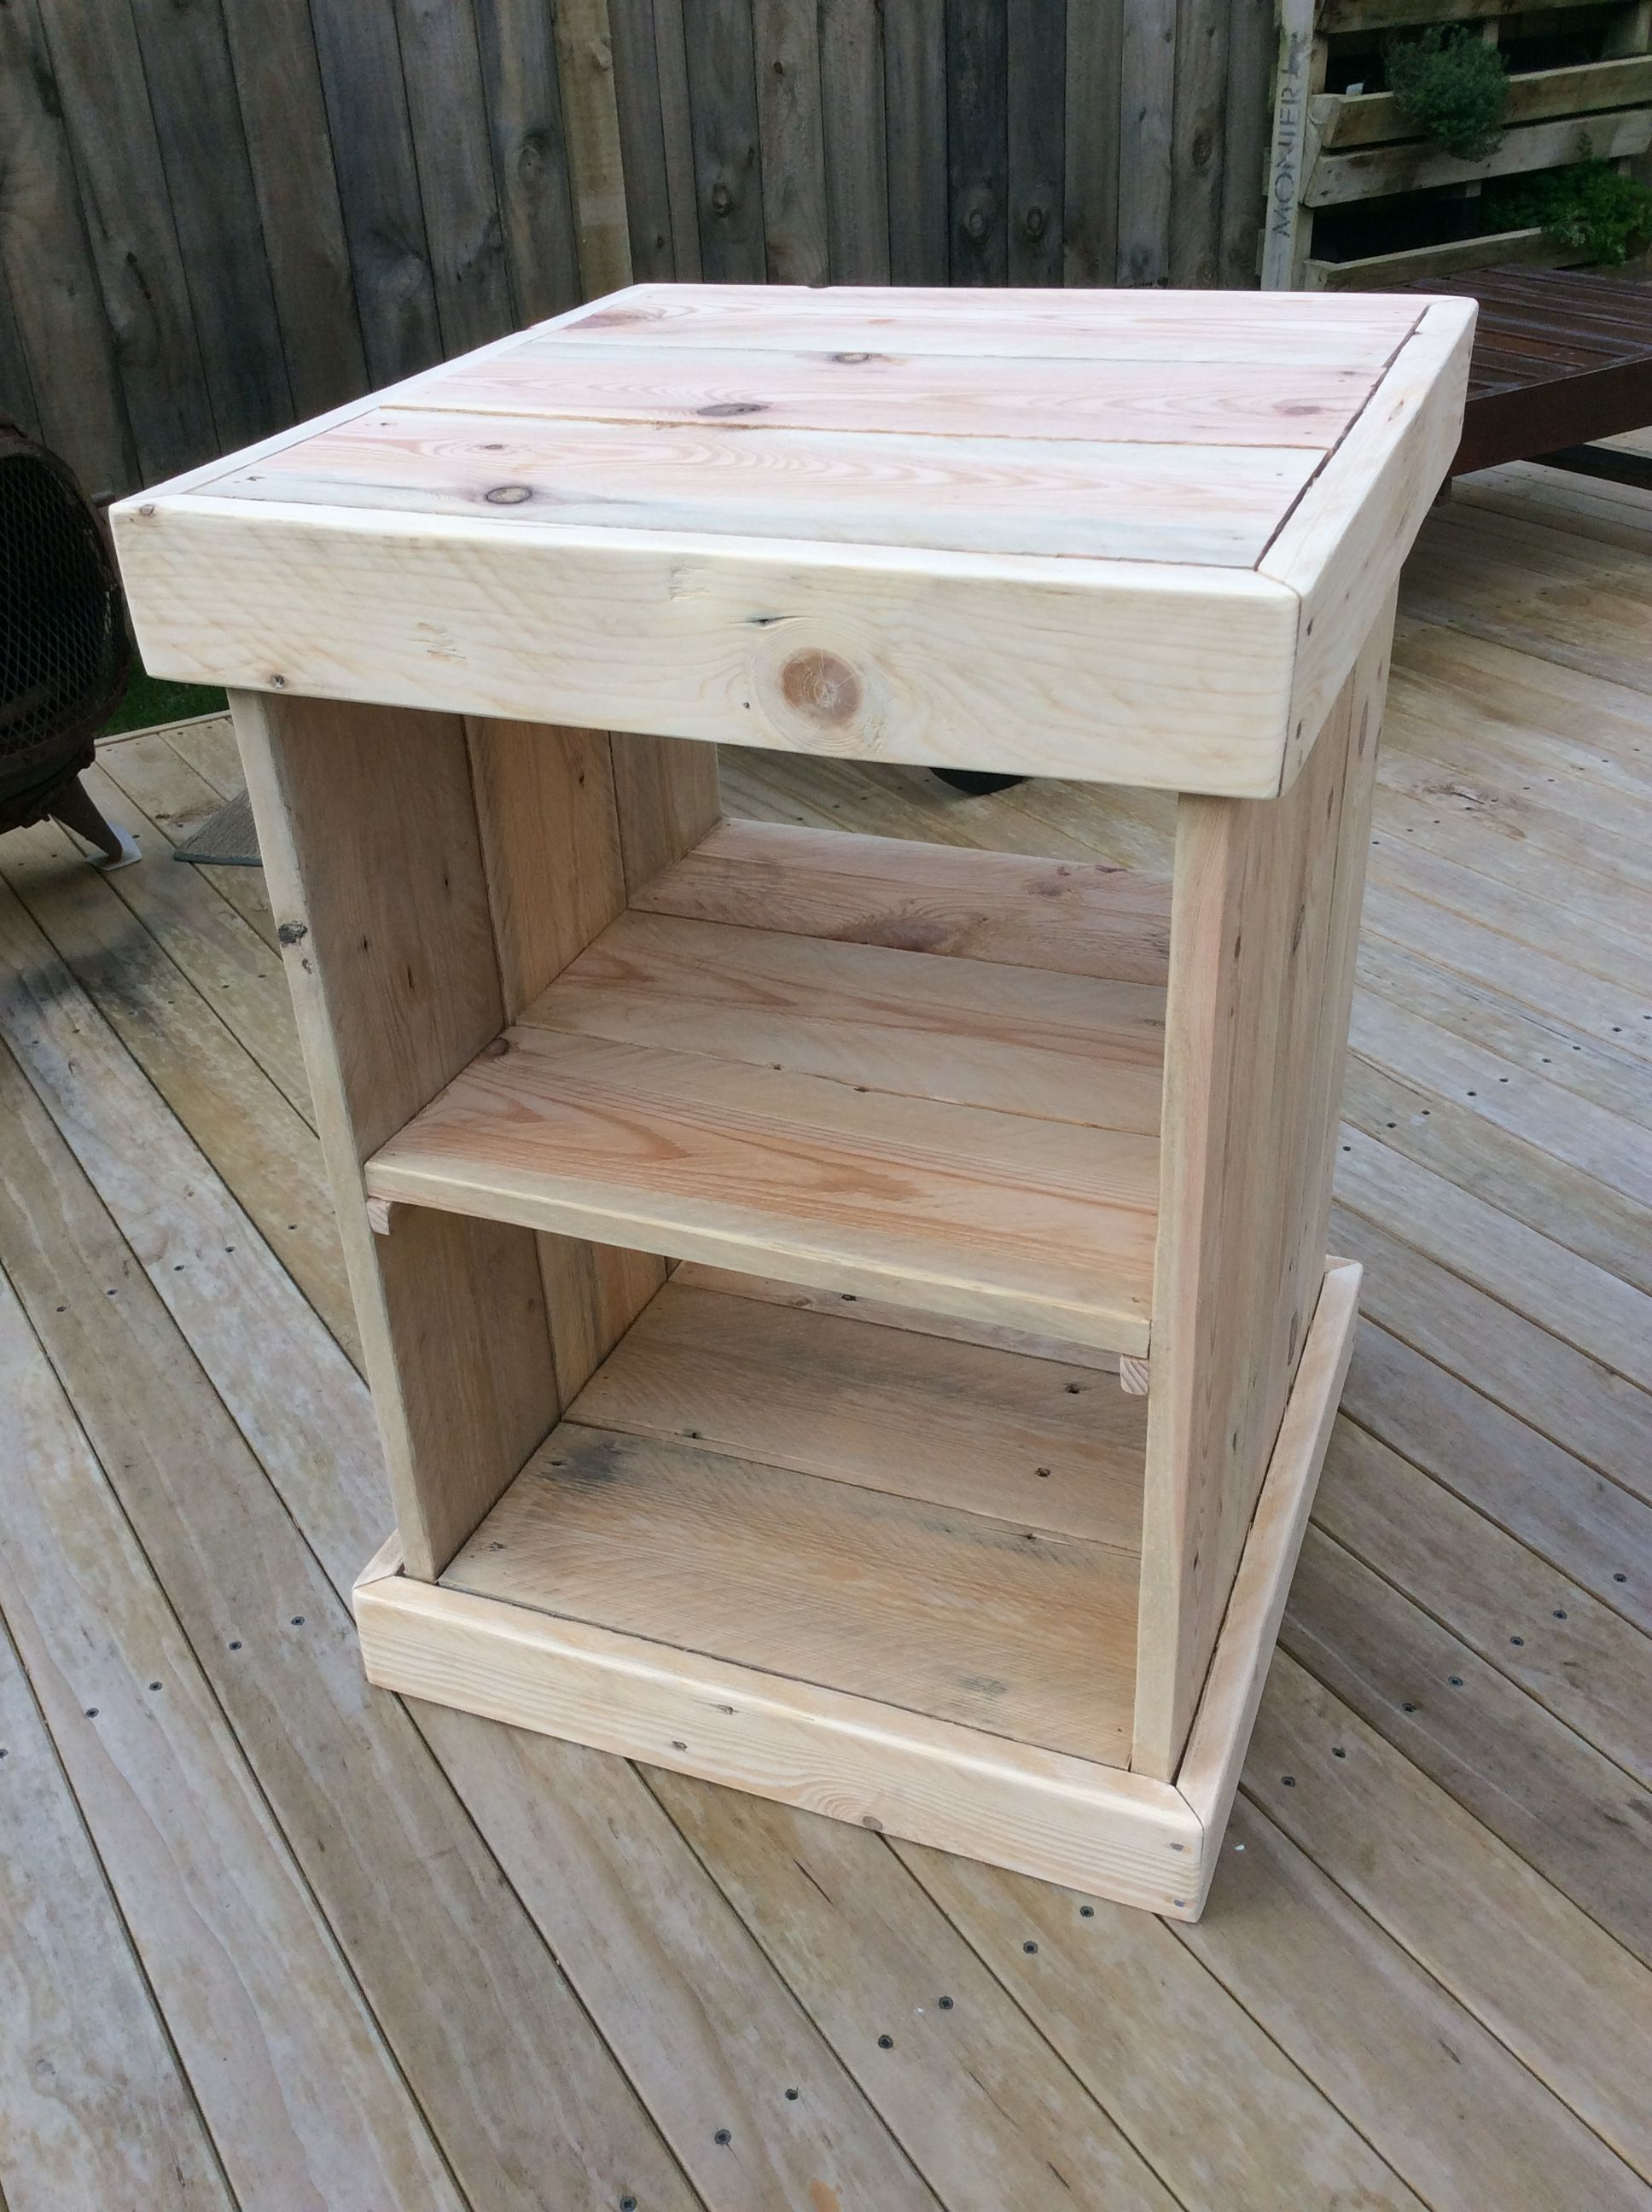 Bed side table pallet side table diy furniture rustic